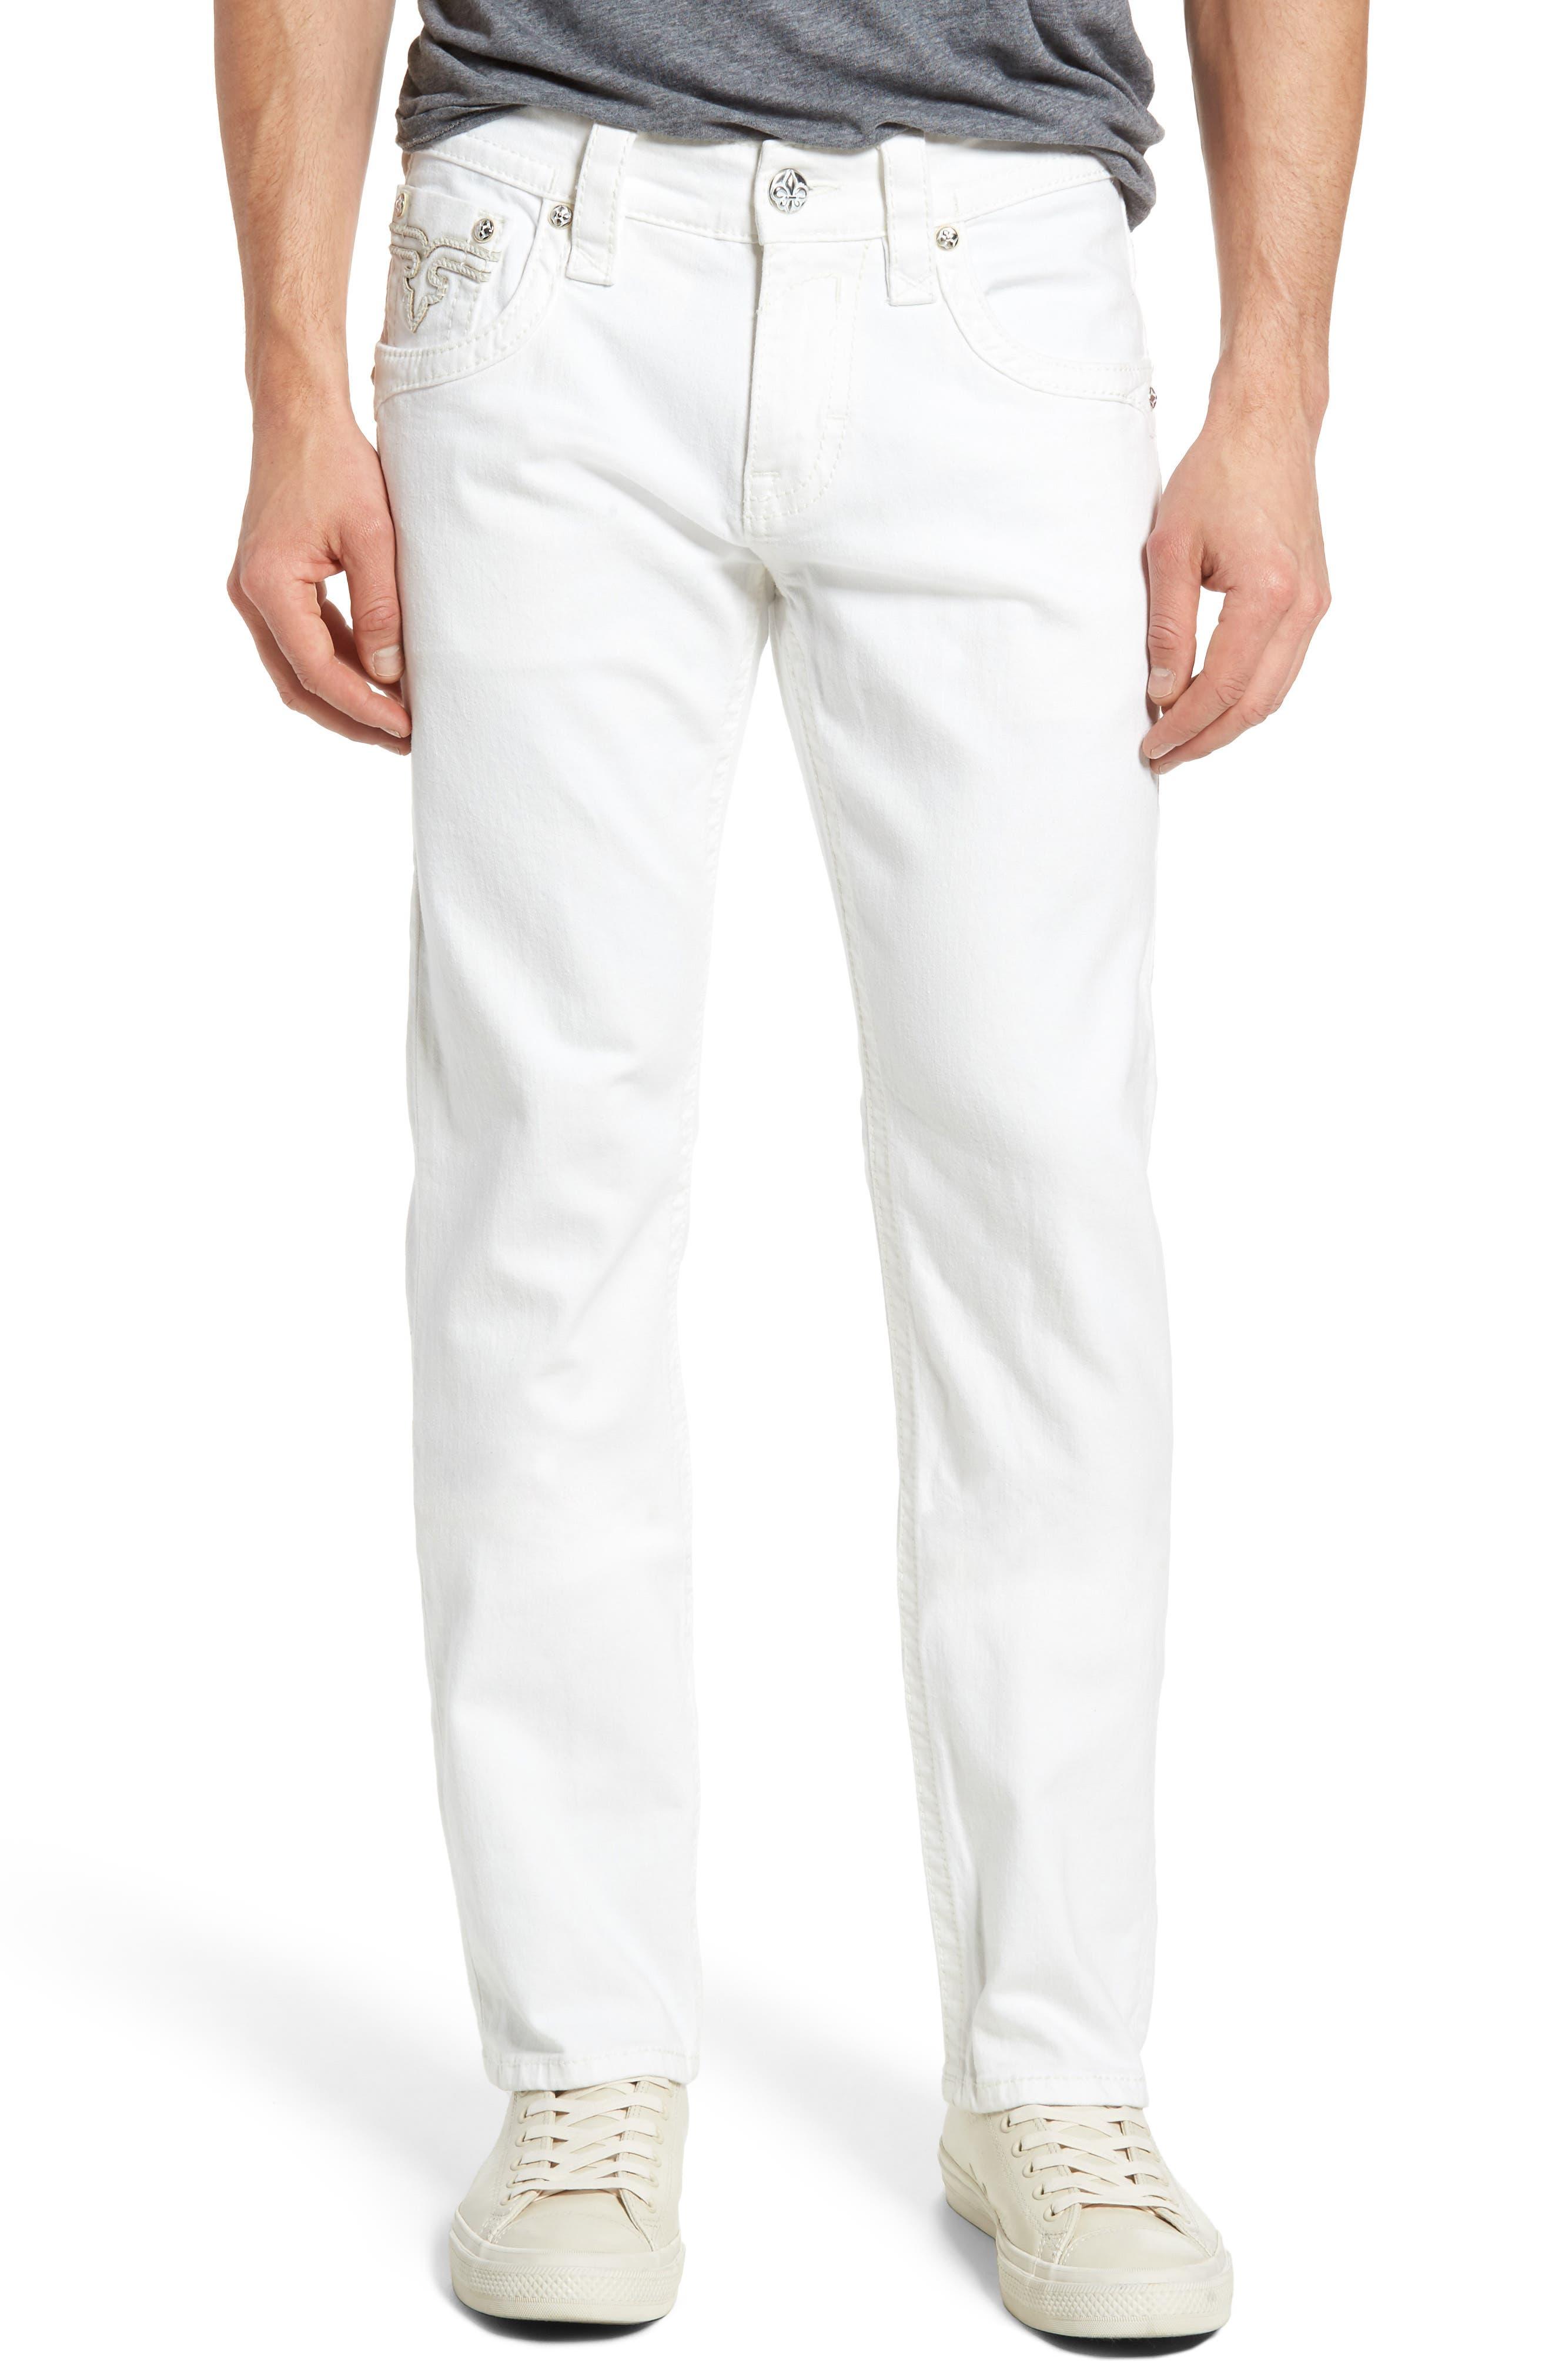 Rock Revival Straight Leg Jeans (Regular & Big)